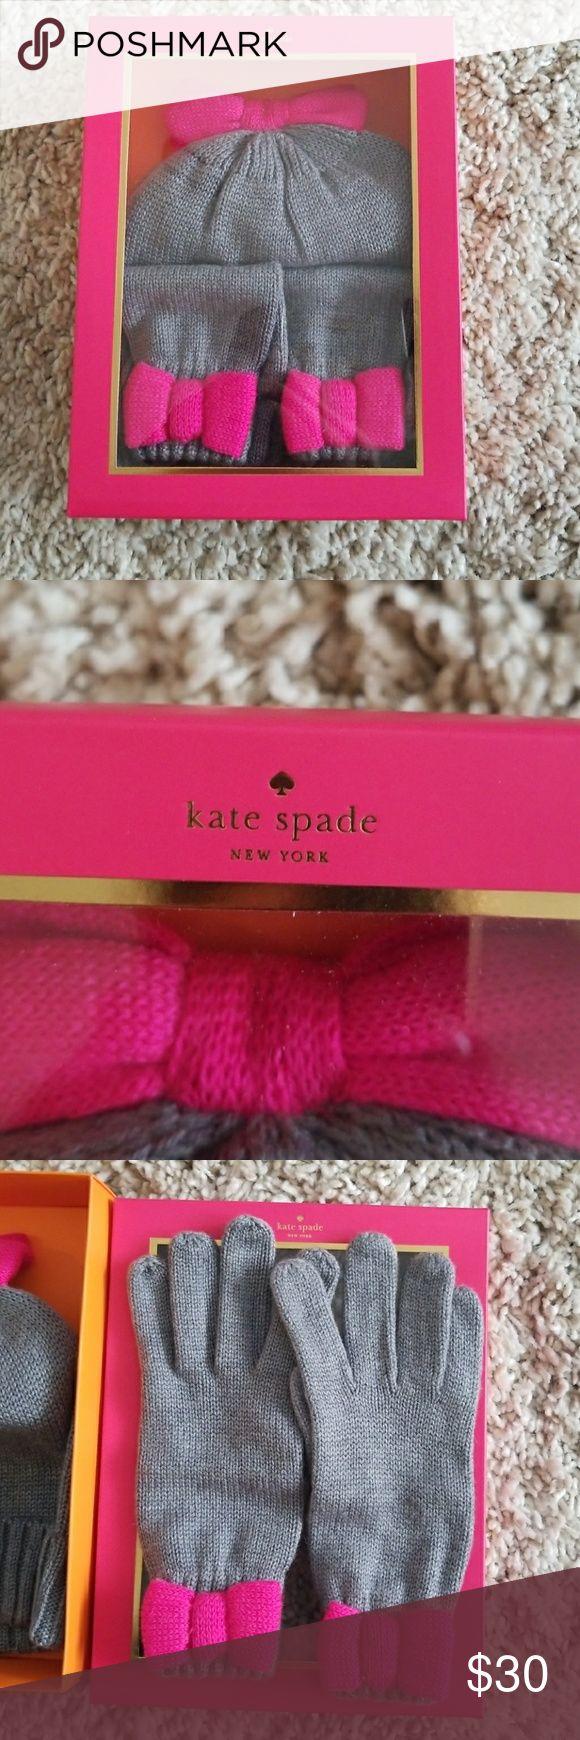 Kate Spade Hat and Mitten Set Girls Brand new gray and pink hat and glove L/XL girls kate spade Accessories Mittens